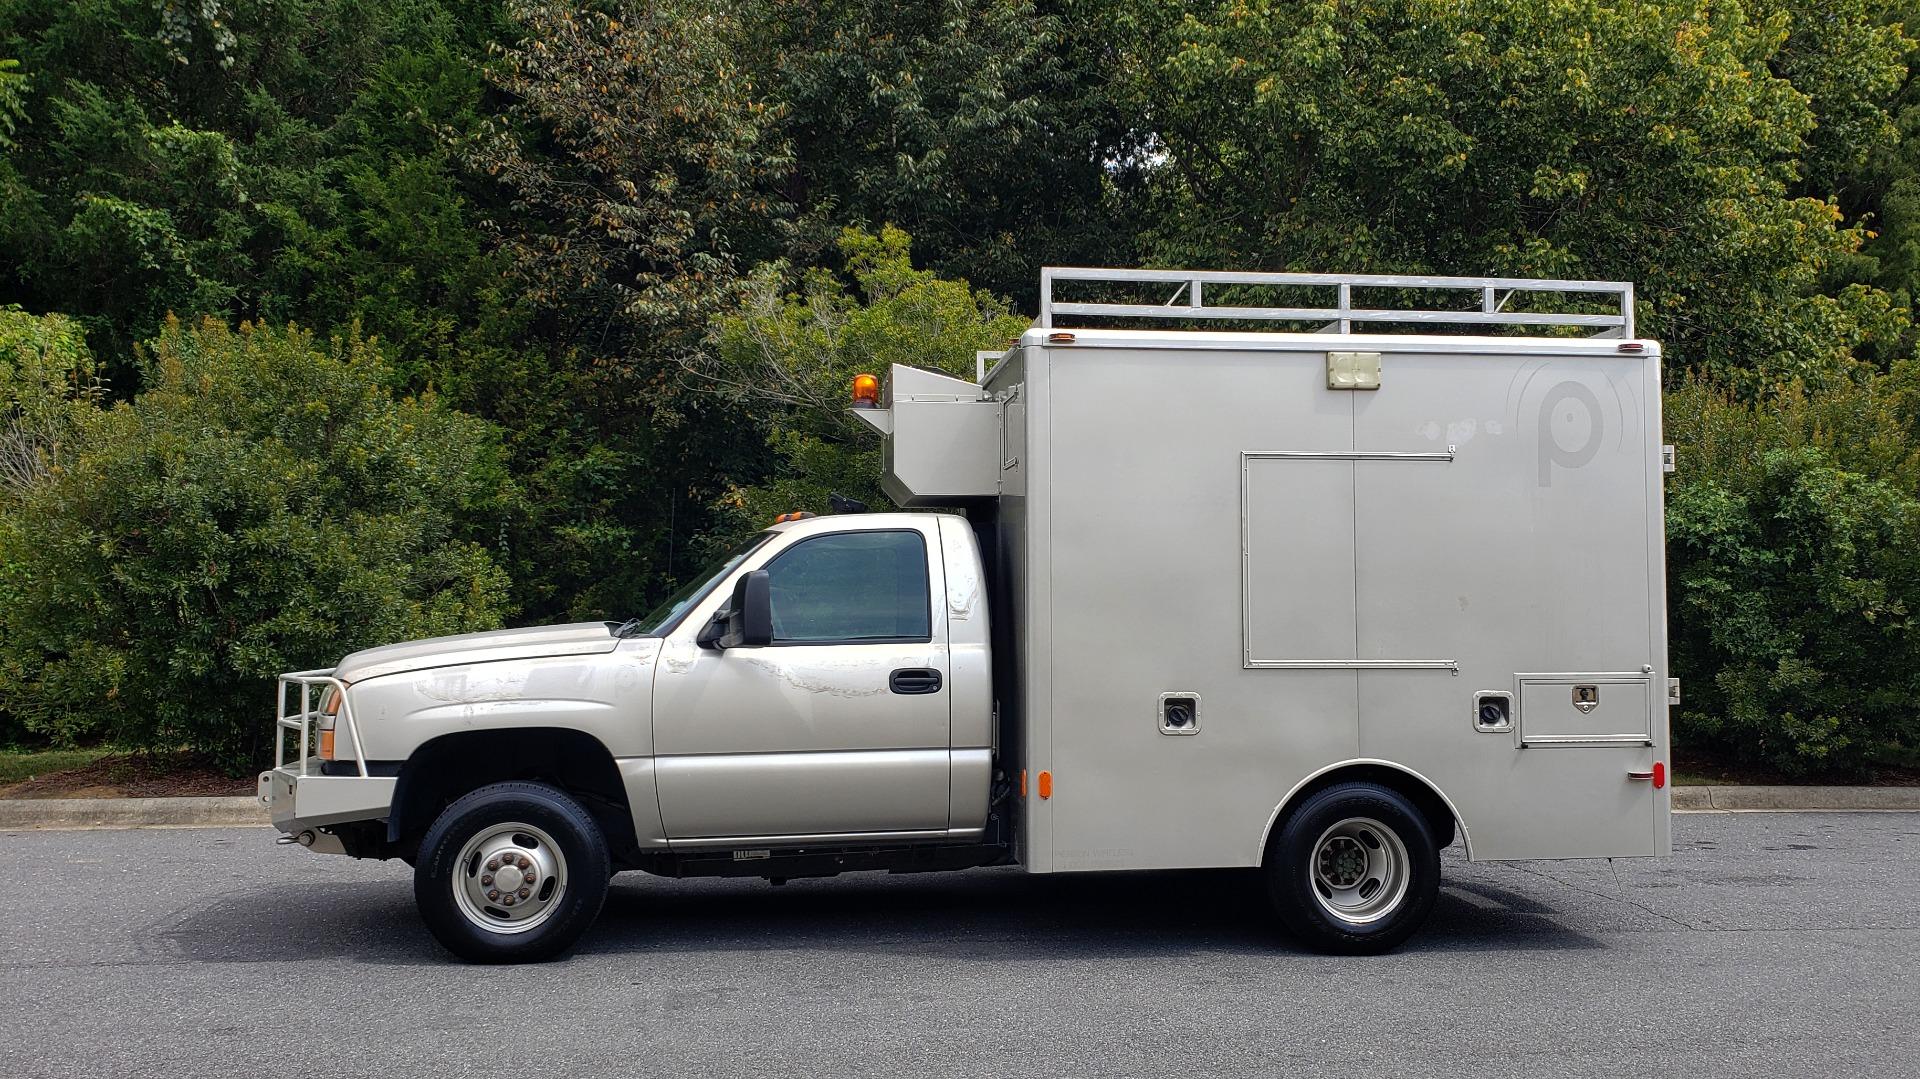 Used 2005 Chevrolet SILVERADO 3500 DRW / 4WD / REG CAB / 6.6L DURAMAX / DOOMSDAY PREPPER for sale $21,595 at Formula Imports in Charlotte NC 28227 2